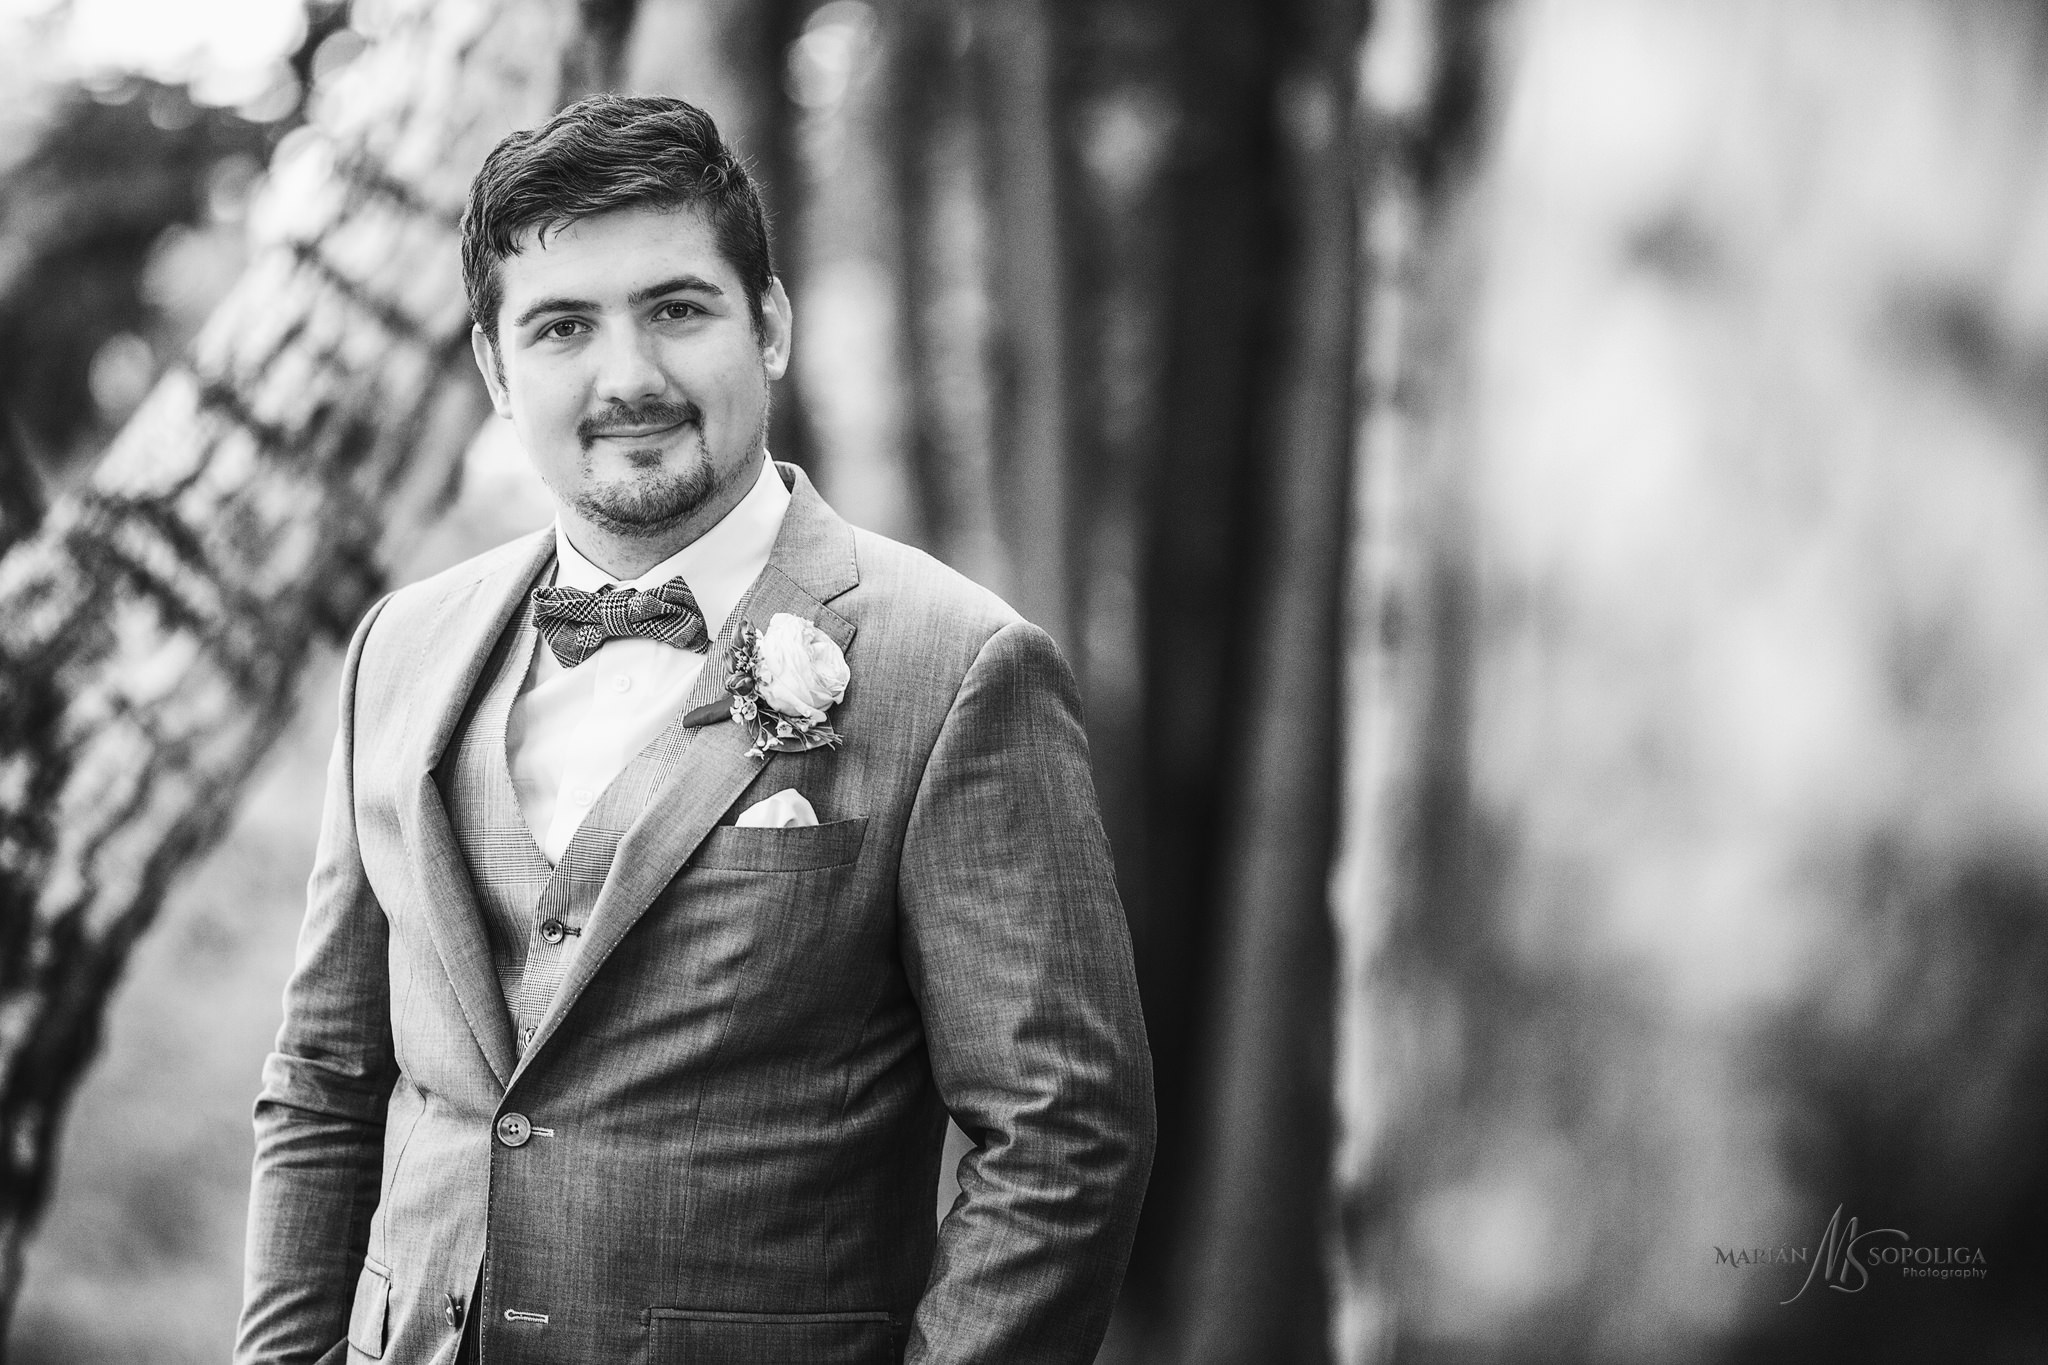 fotografovani-svatby-na-brnenske-prehrade-svatebni-portret-zenic